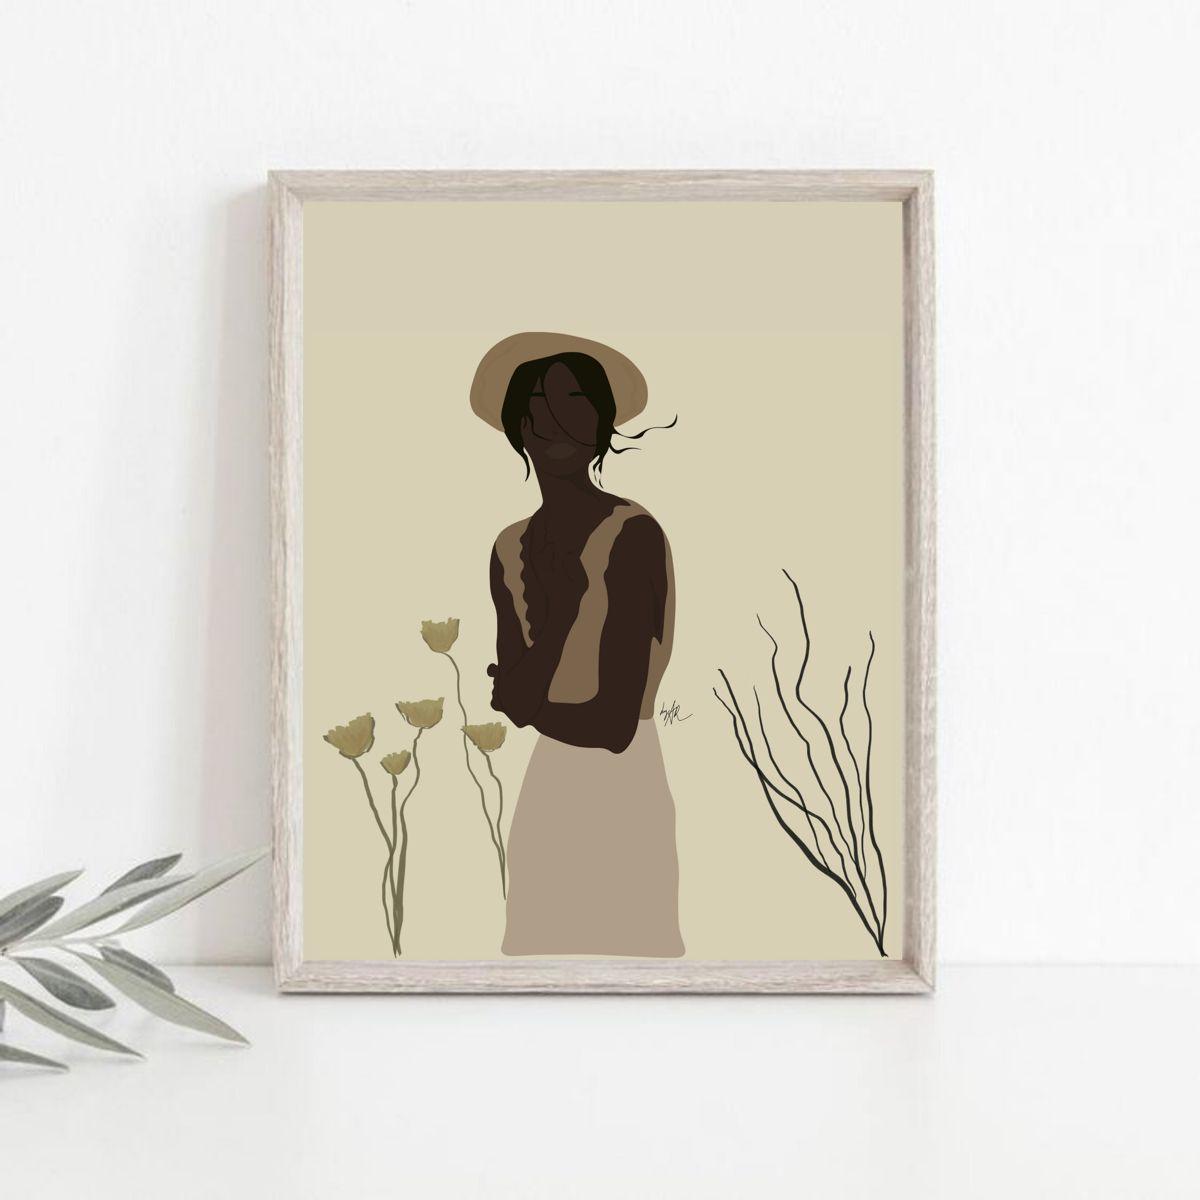 #womanillustration #womanportrait #digitalillustration#digitalart #print #decor #walldecor #bohoprints #bohoinspo #bohowoman #shopprints #printsforsale #decoration#inspo #homedecor #decor #wallart #wallprints #decorationideas